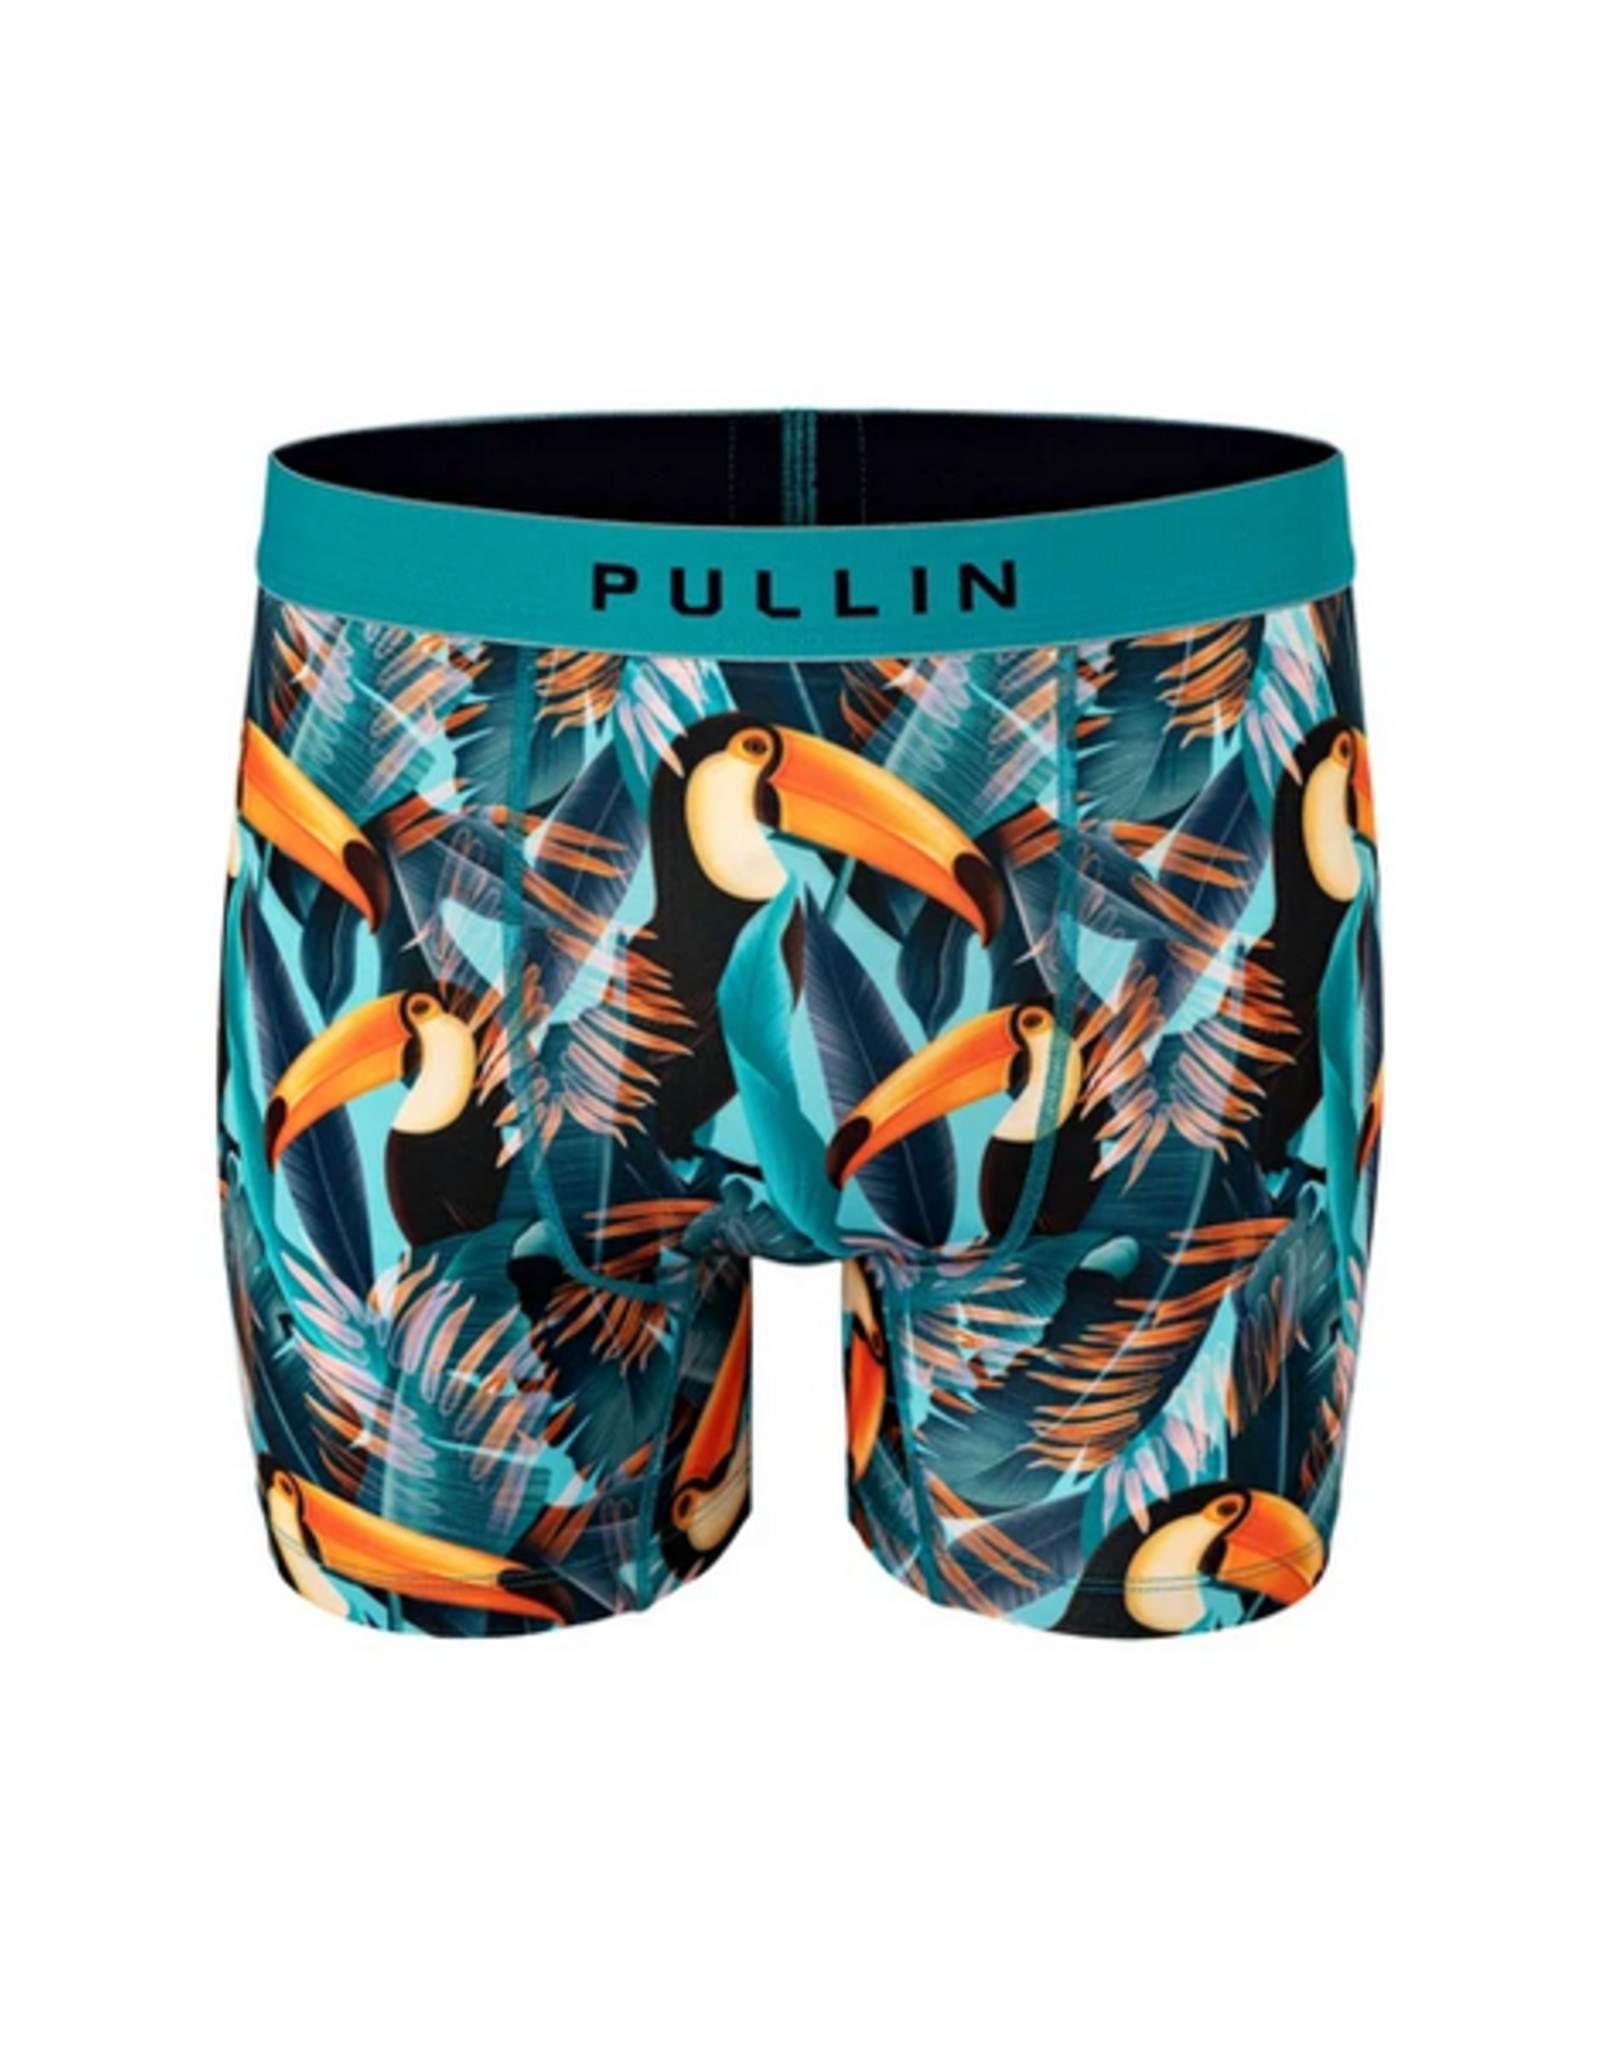 Pullin Fashion 2 ORANGE TOUC